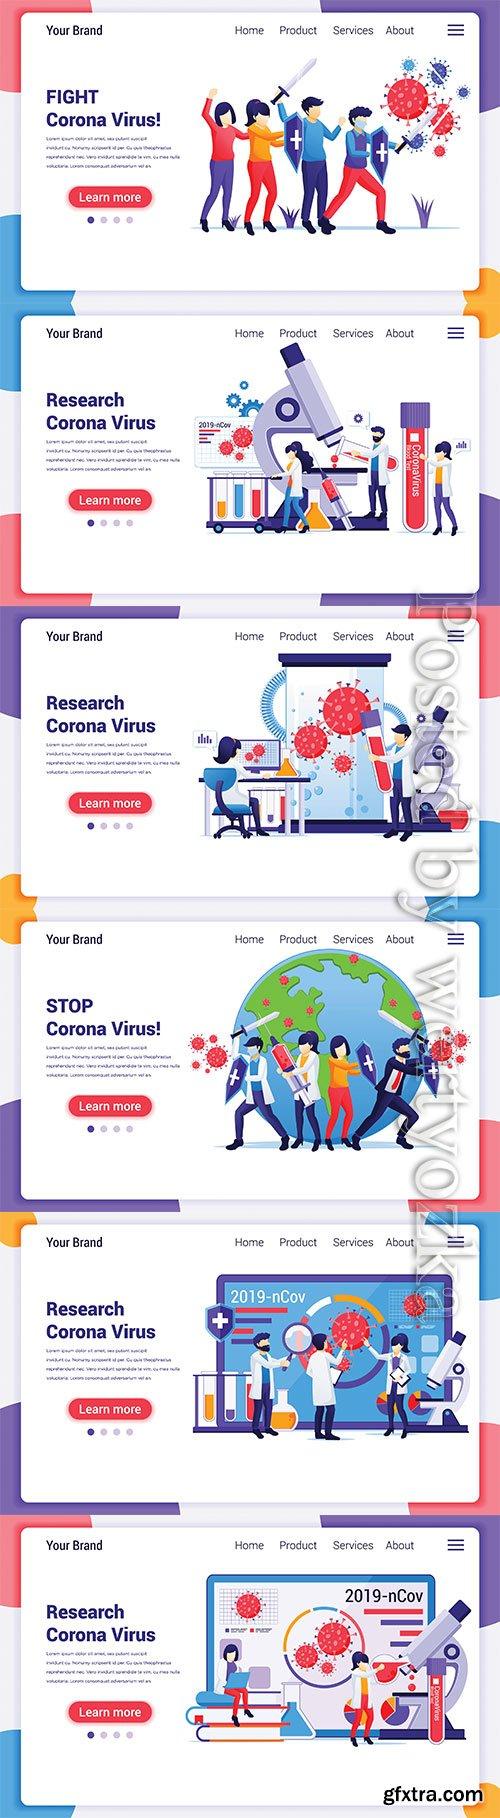 Research laboratory concept for Covid-19 Corona virus with scientists working at medicine laboratorium